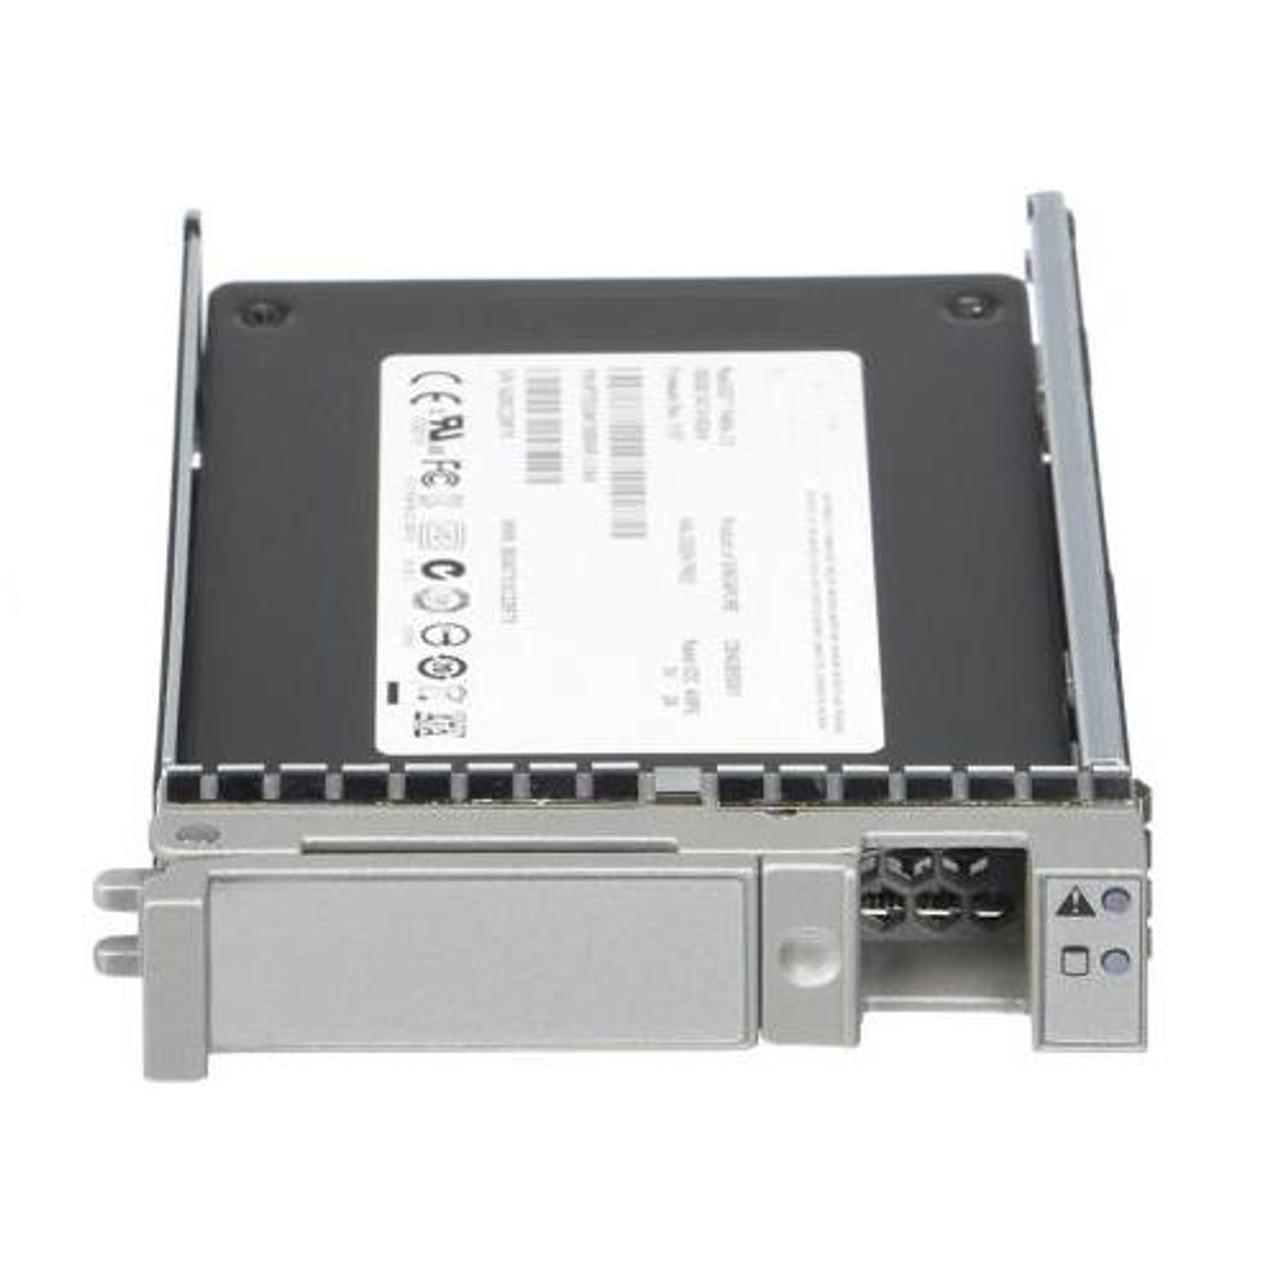 ASA5500X-SSD120INC Cisco 120GB MLC Hot Swap (SED) Internal Solid State  Drive (SSD) for ASA 5512-X